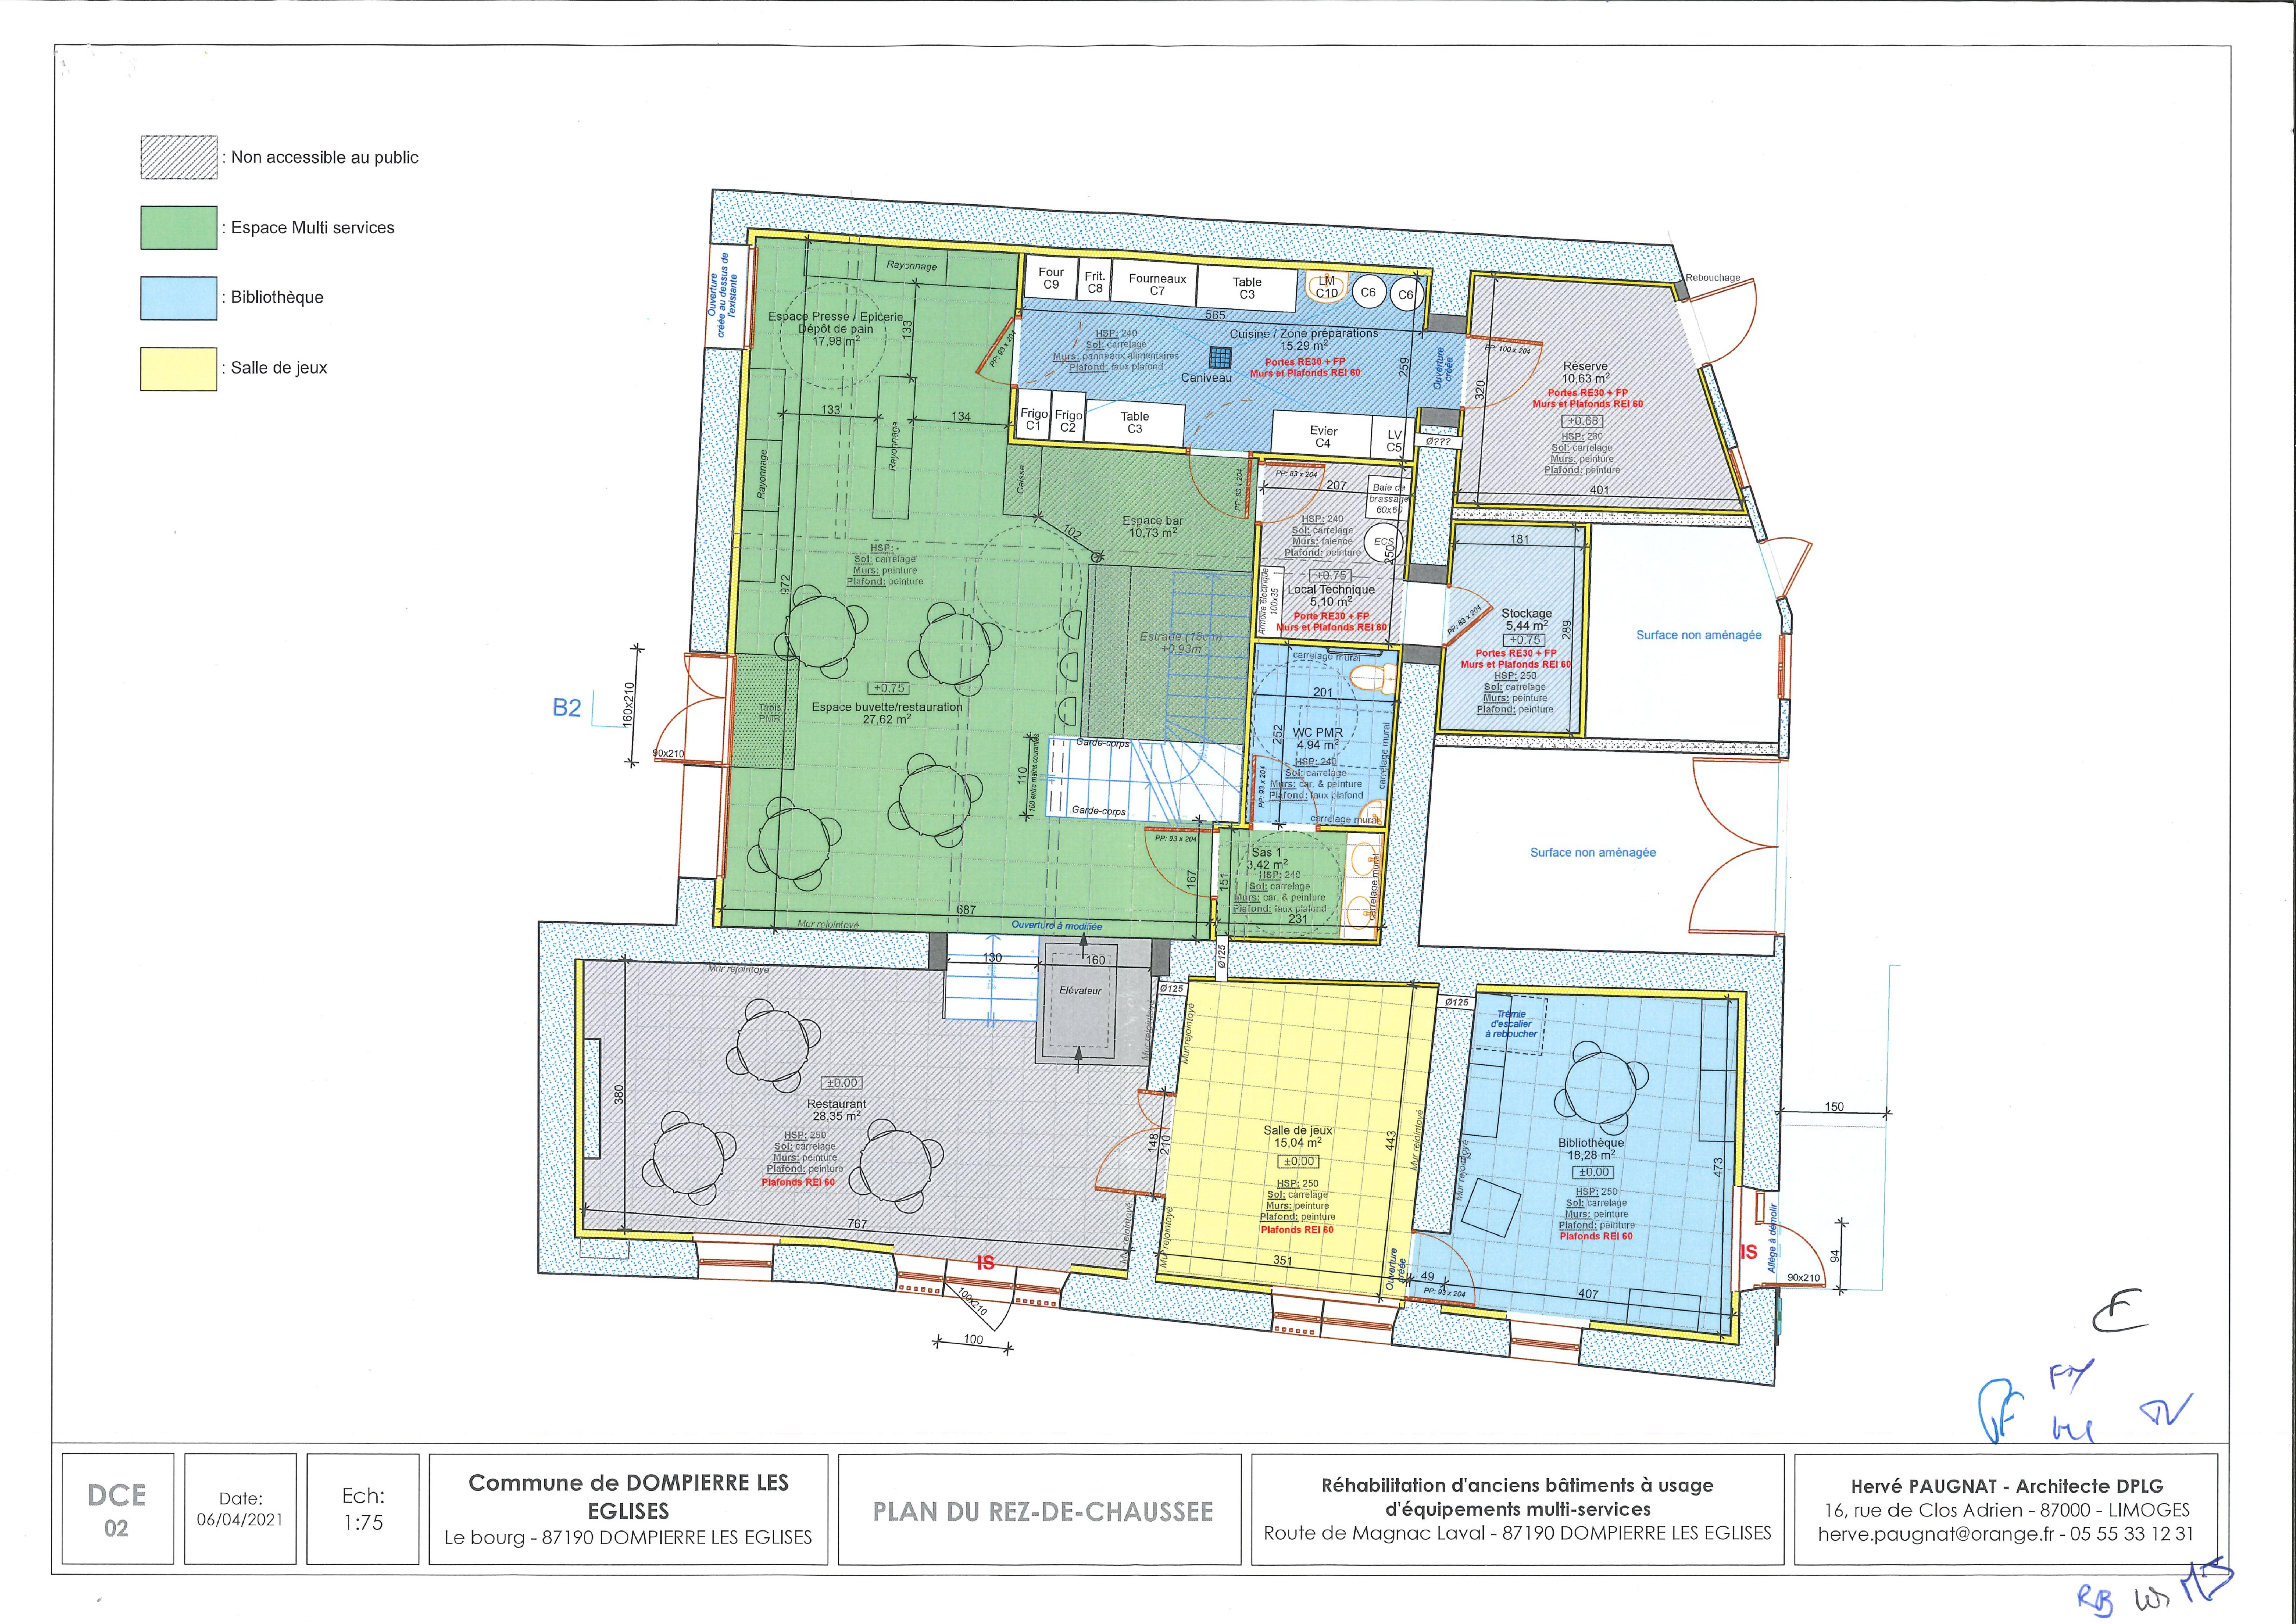 Plan projet multi-services-001-001.jpg